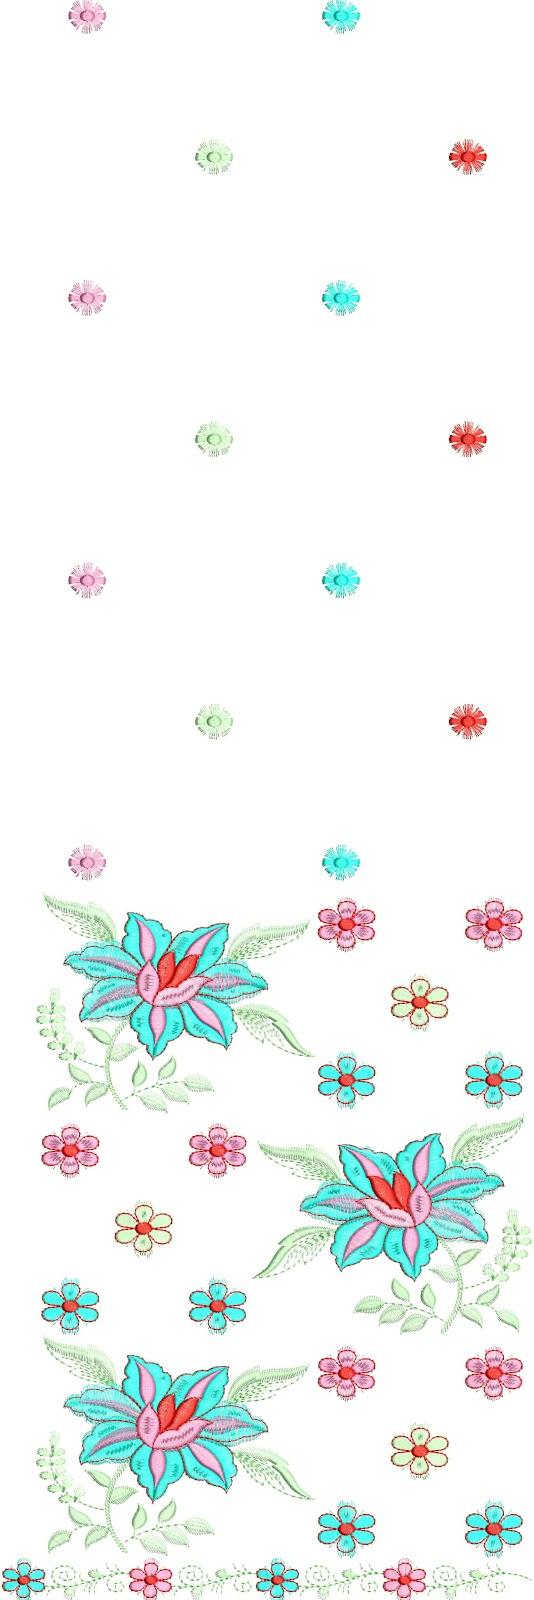 Embdesigntube daman embroidery desings free download